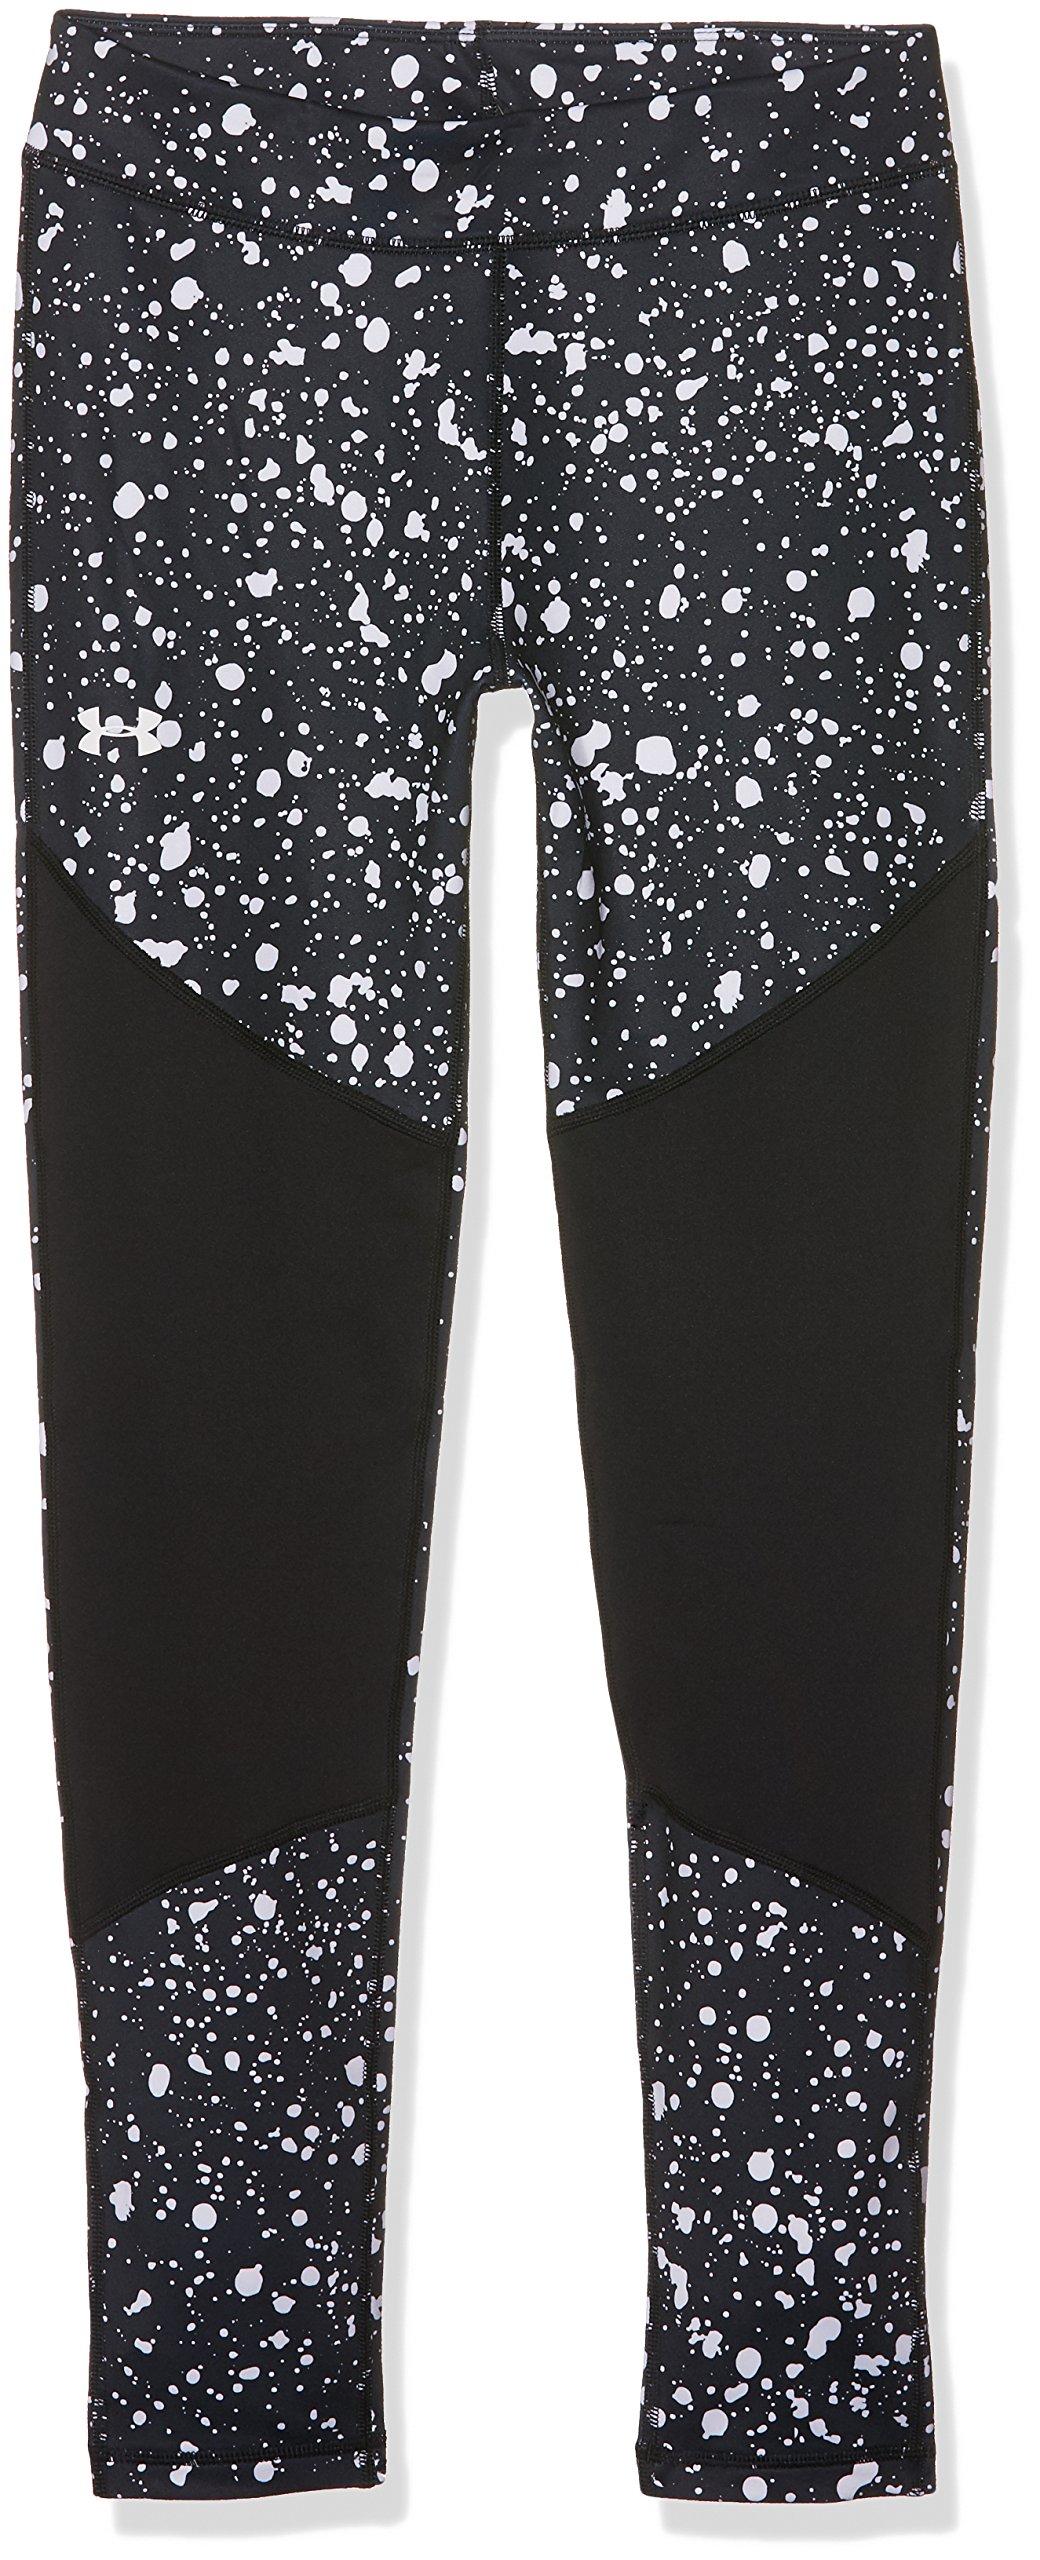 Under Armour Girls' ColdGear Novelty Leggings,Black (001)/White, Youth X-Large